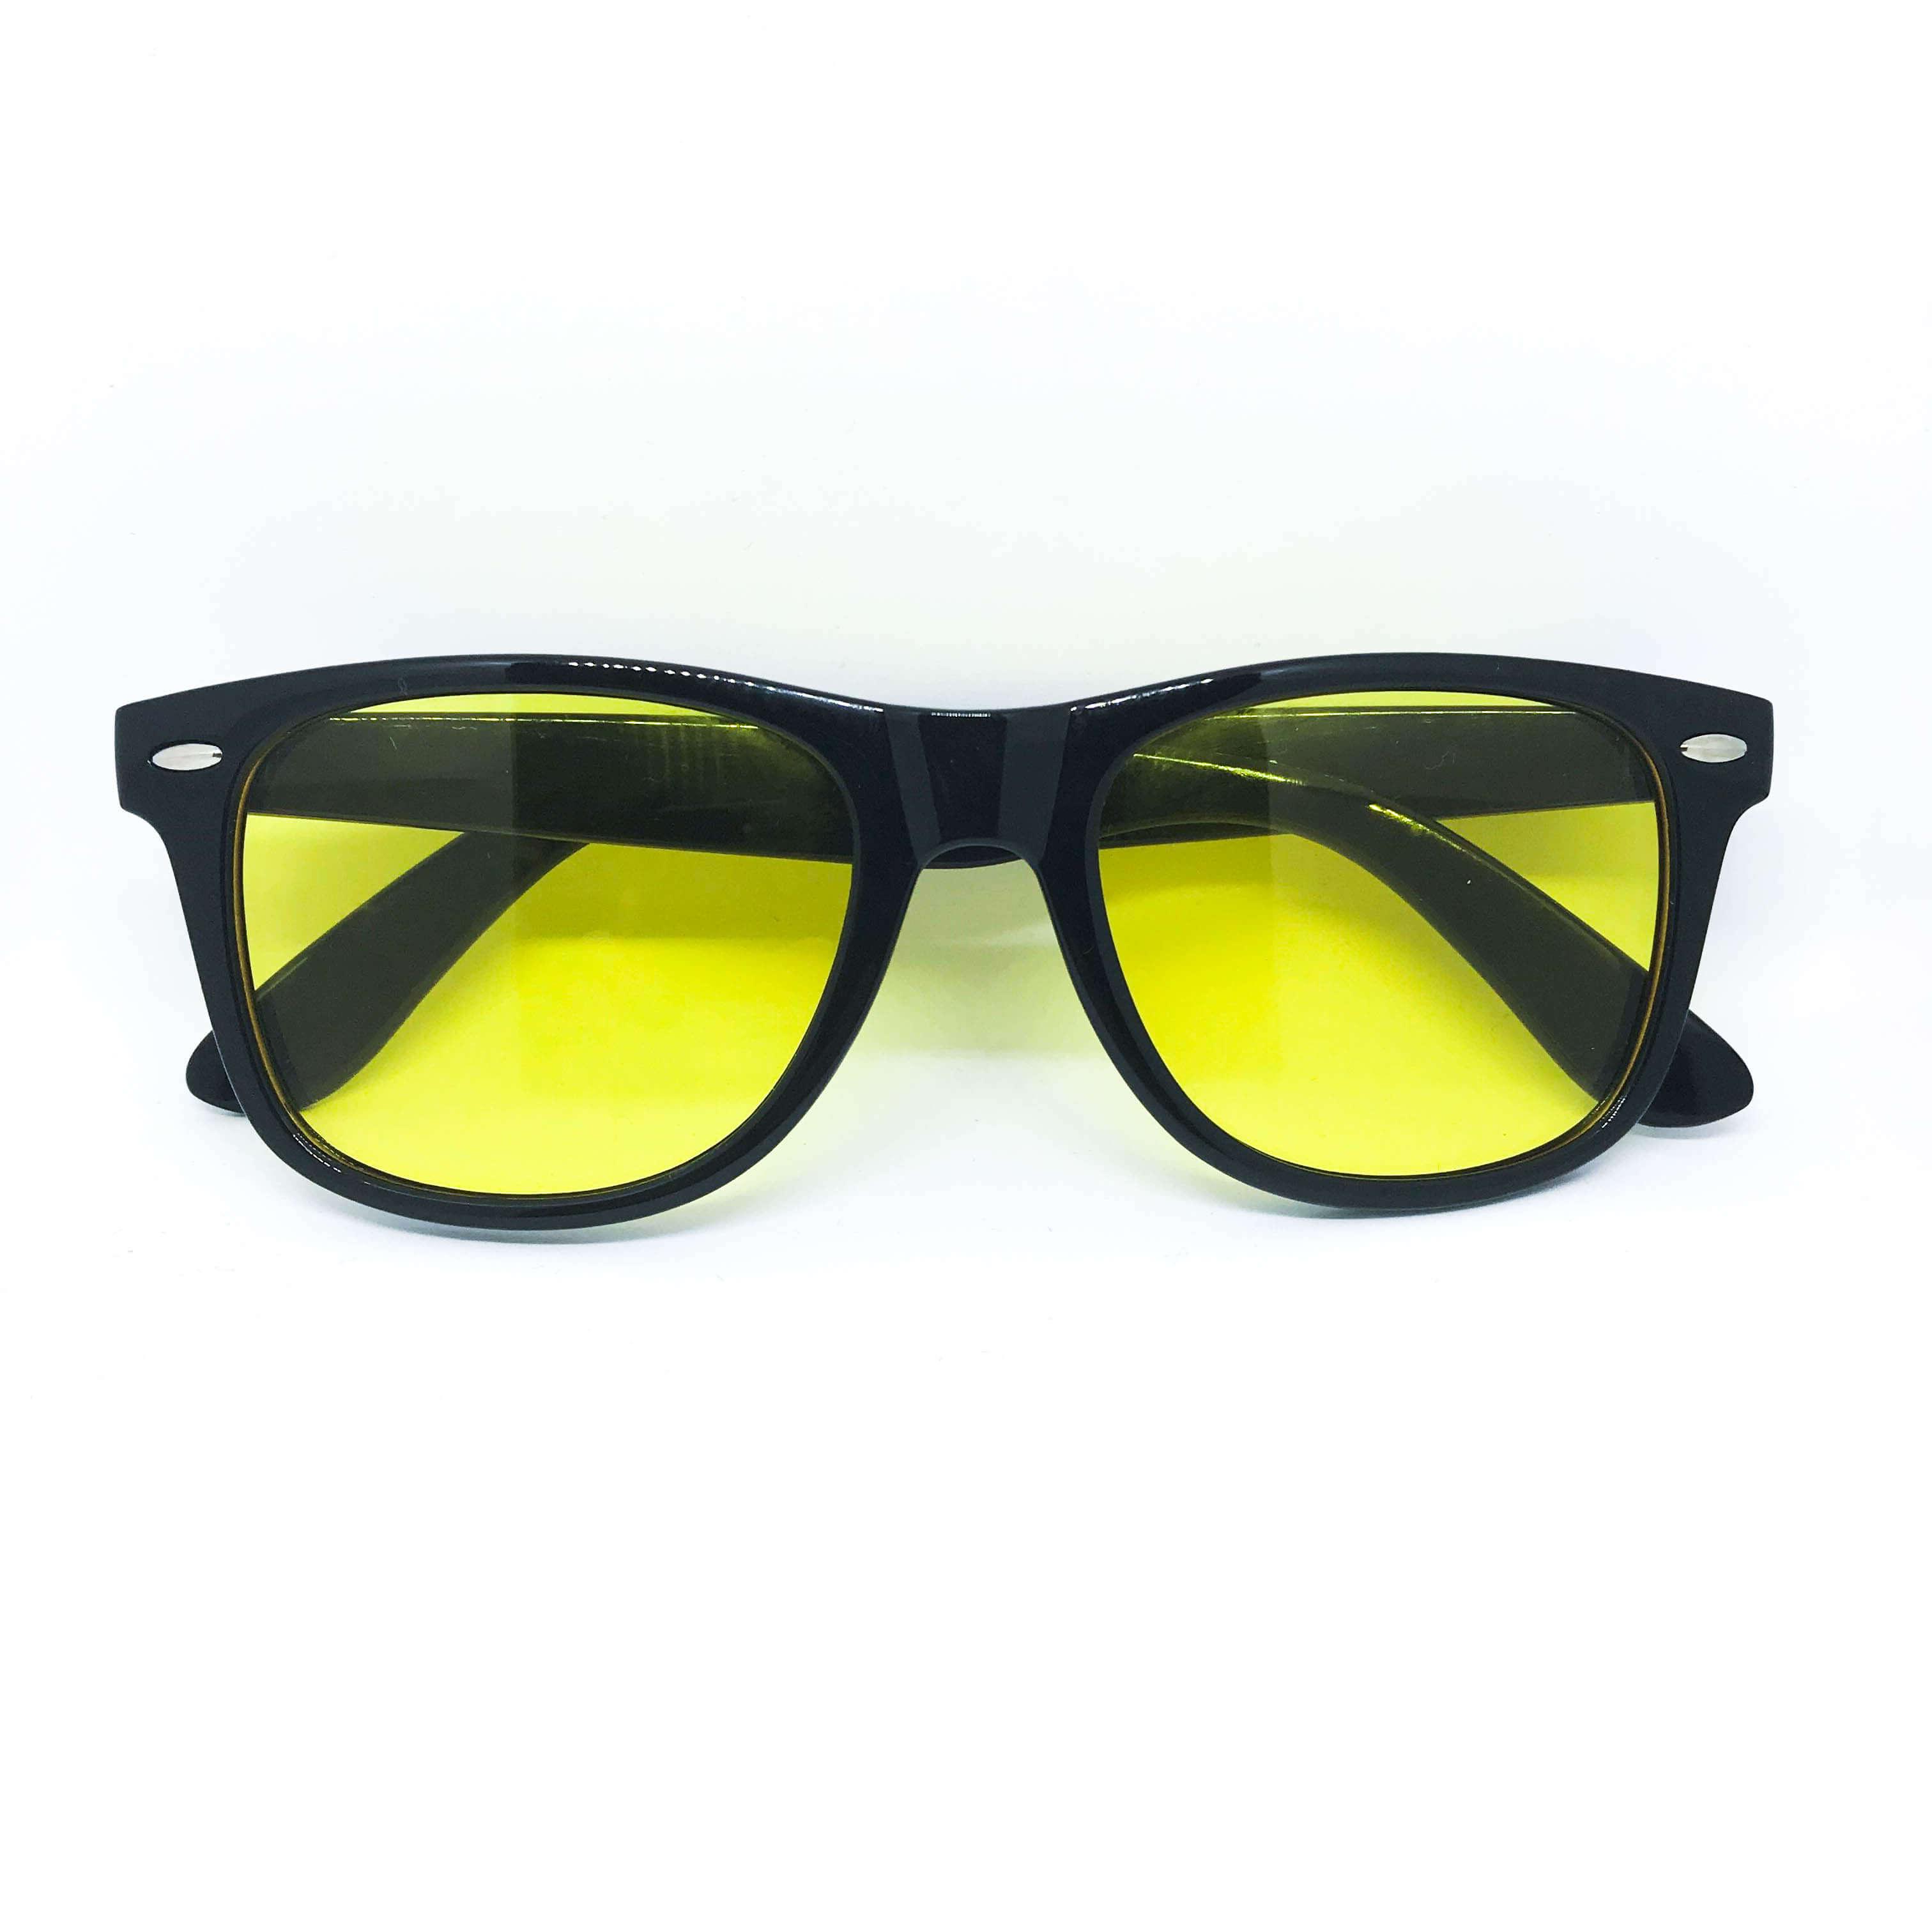 Original Blue Light Blocking Glasses